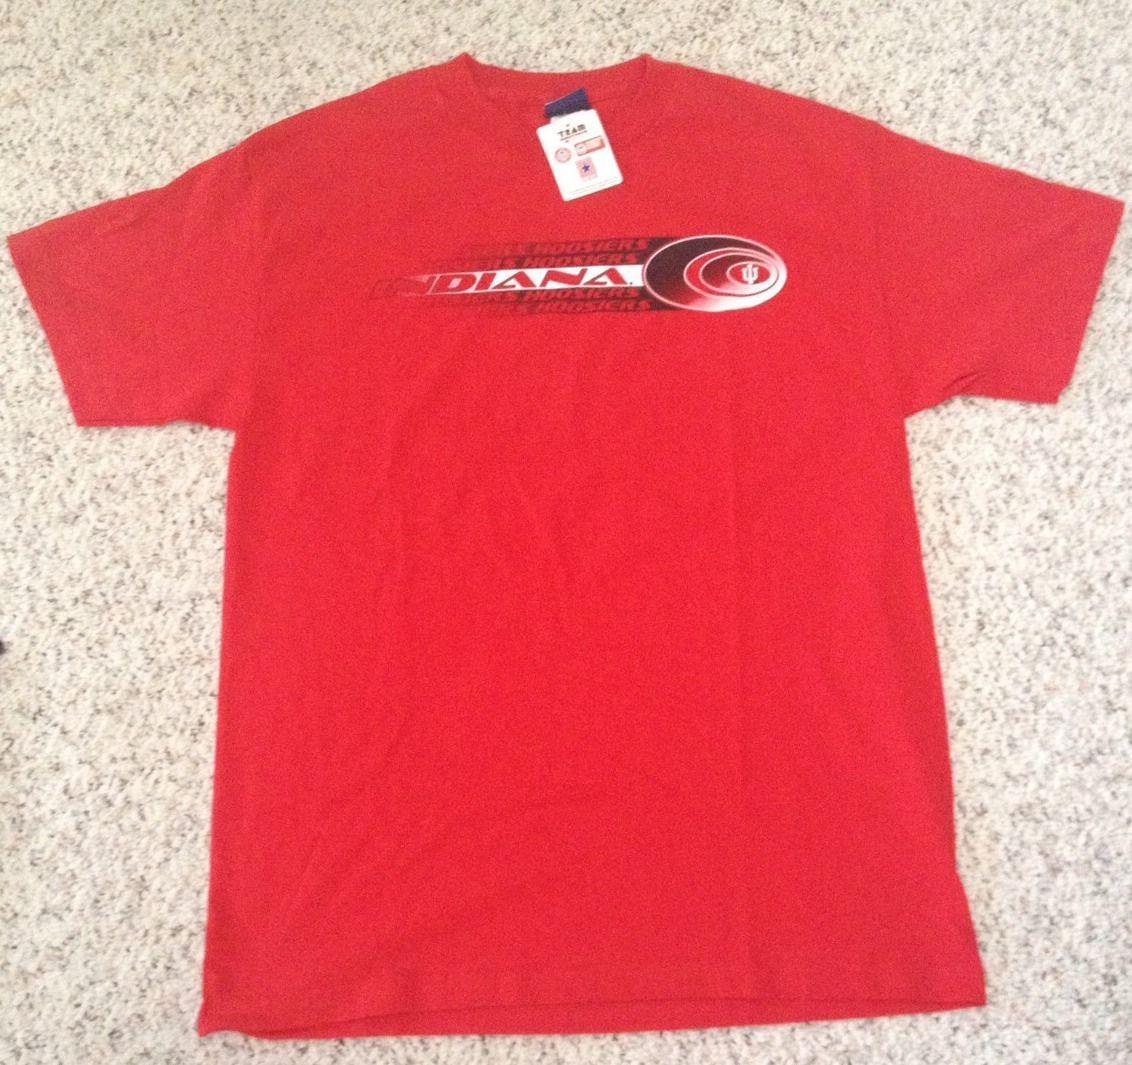 NEW - INDIANA UNIVERSITY Men's T-shirt - Hoosiers - Sz (M)